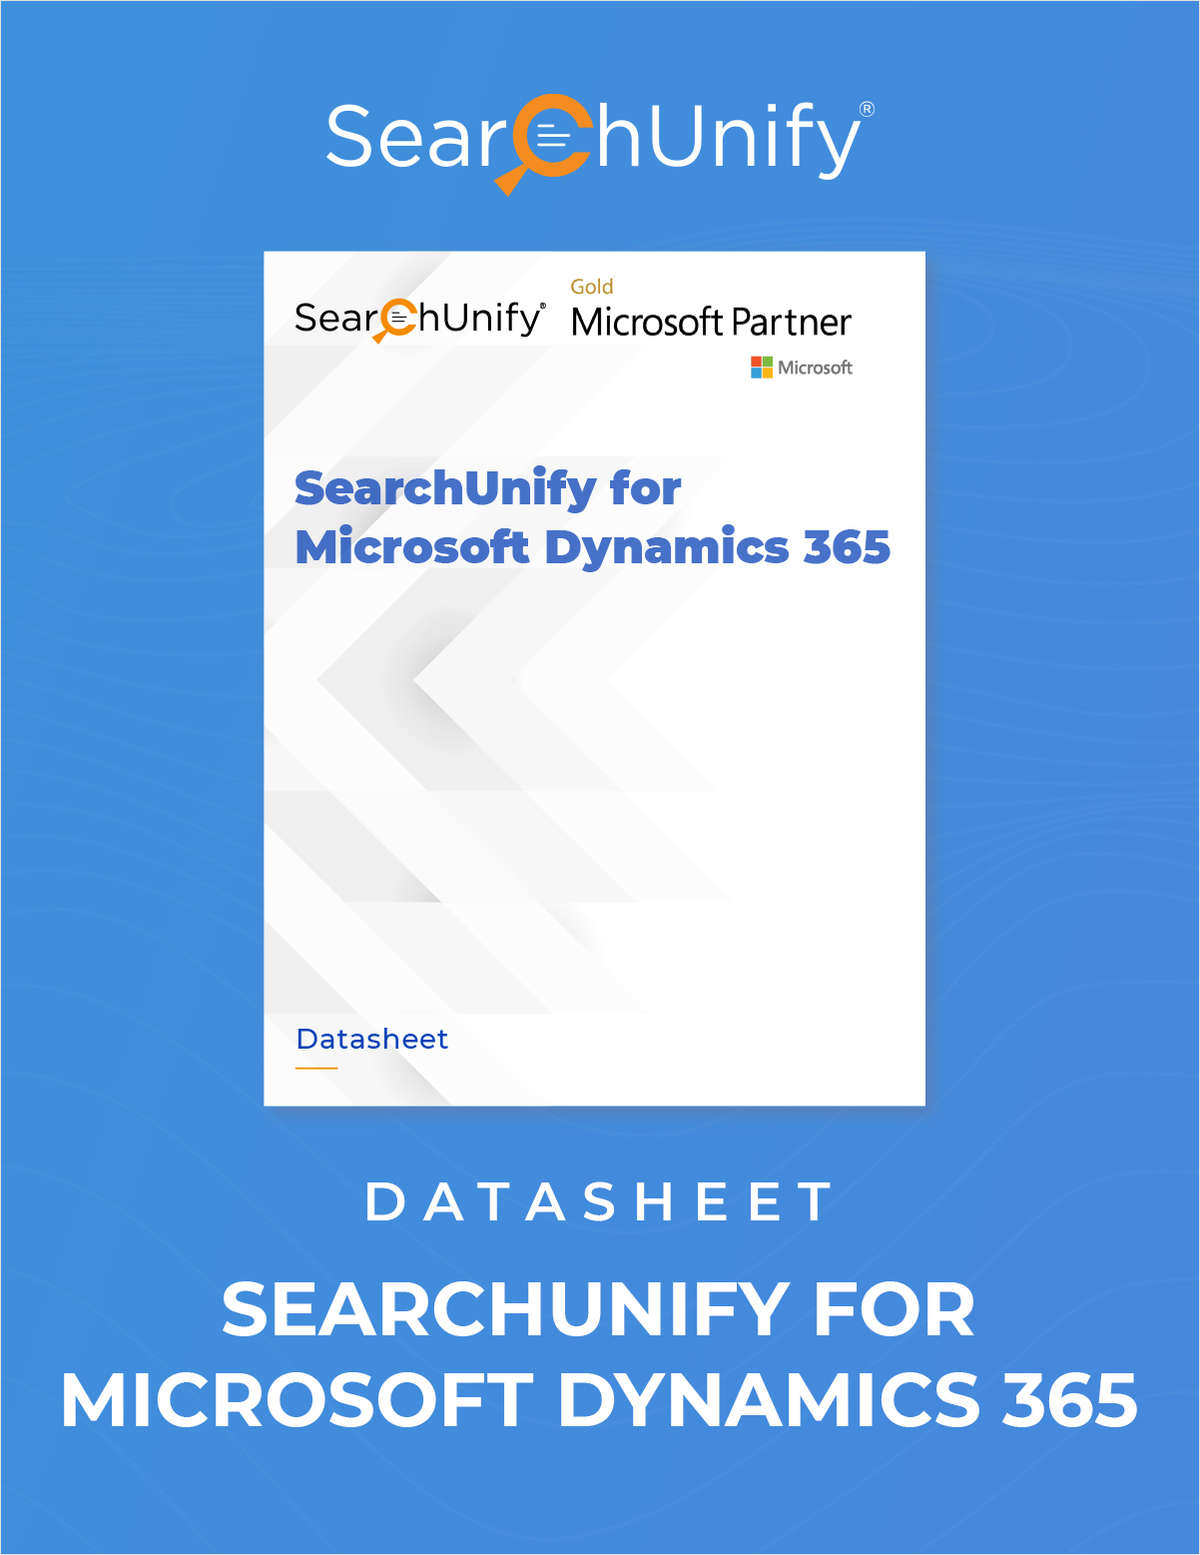 SearchUnify for Microsoft Dynamics 365